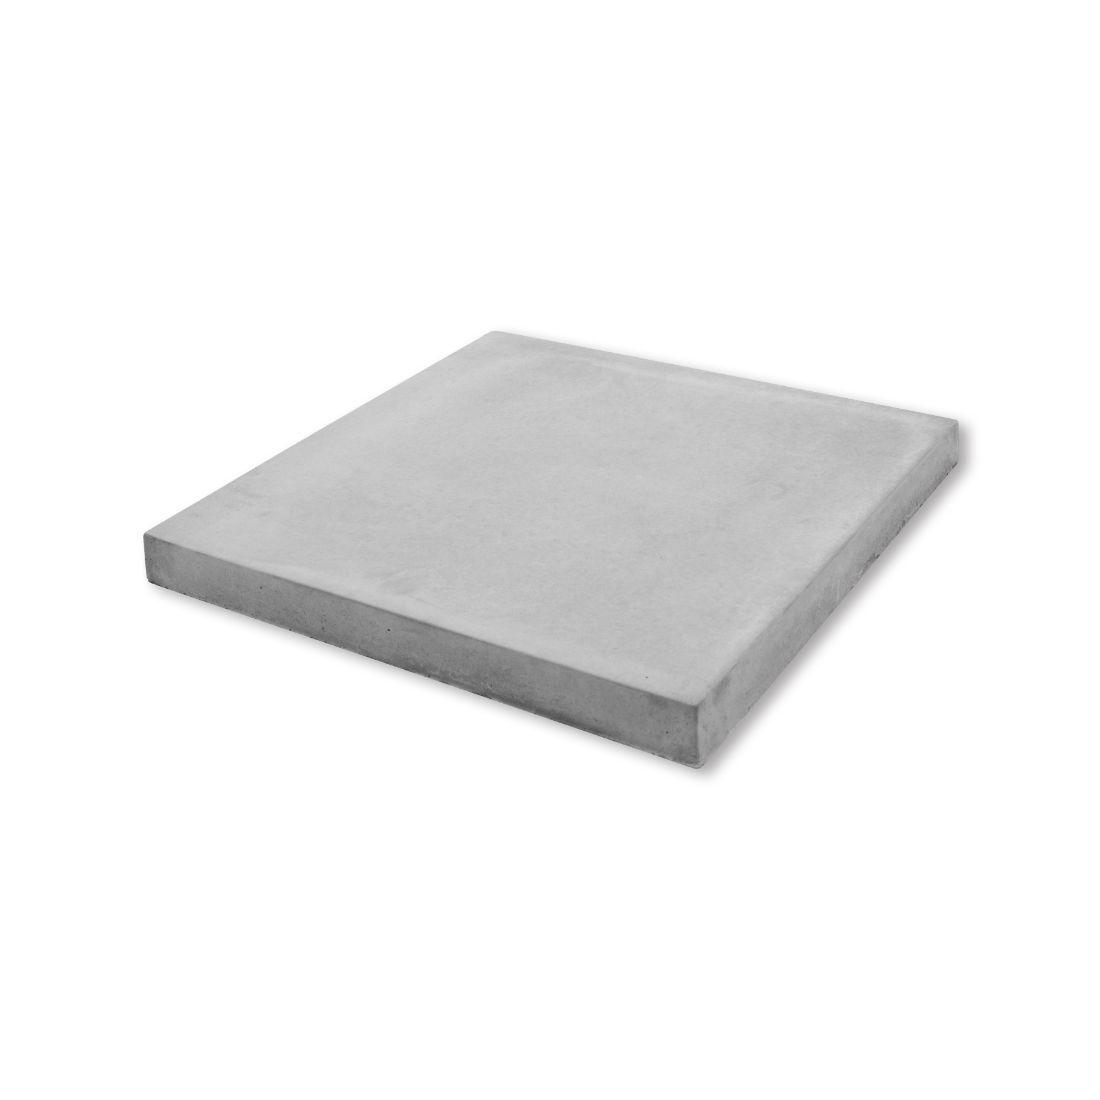 Milano Concrete Paver 600 x 600 x 37mm Natural Stone